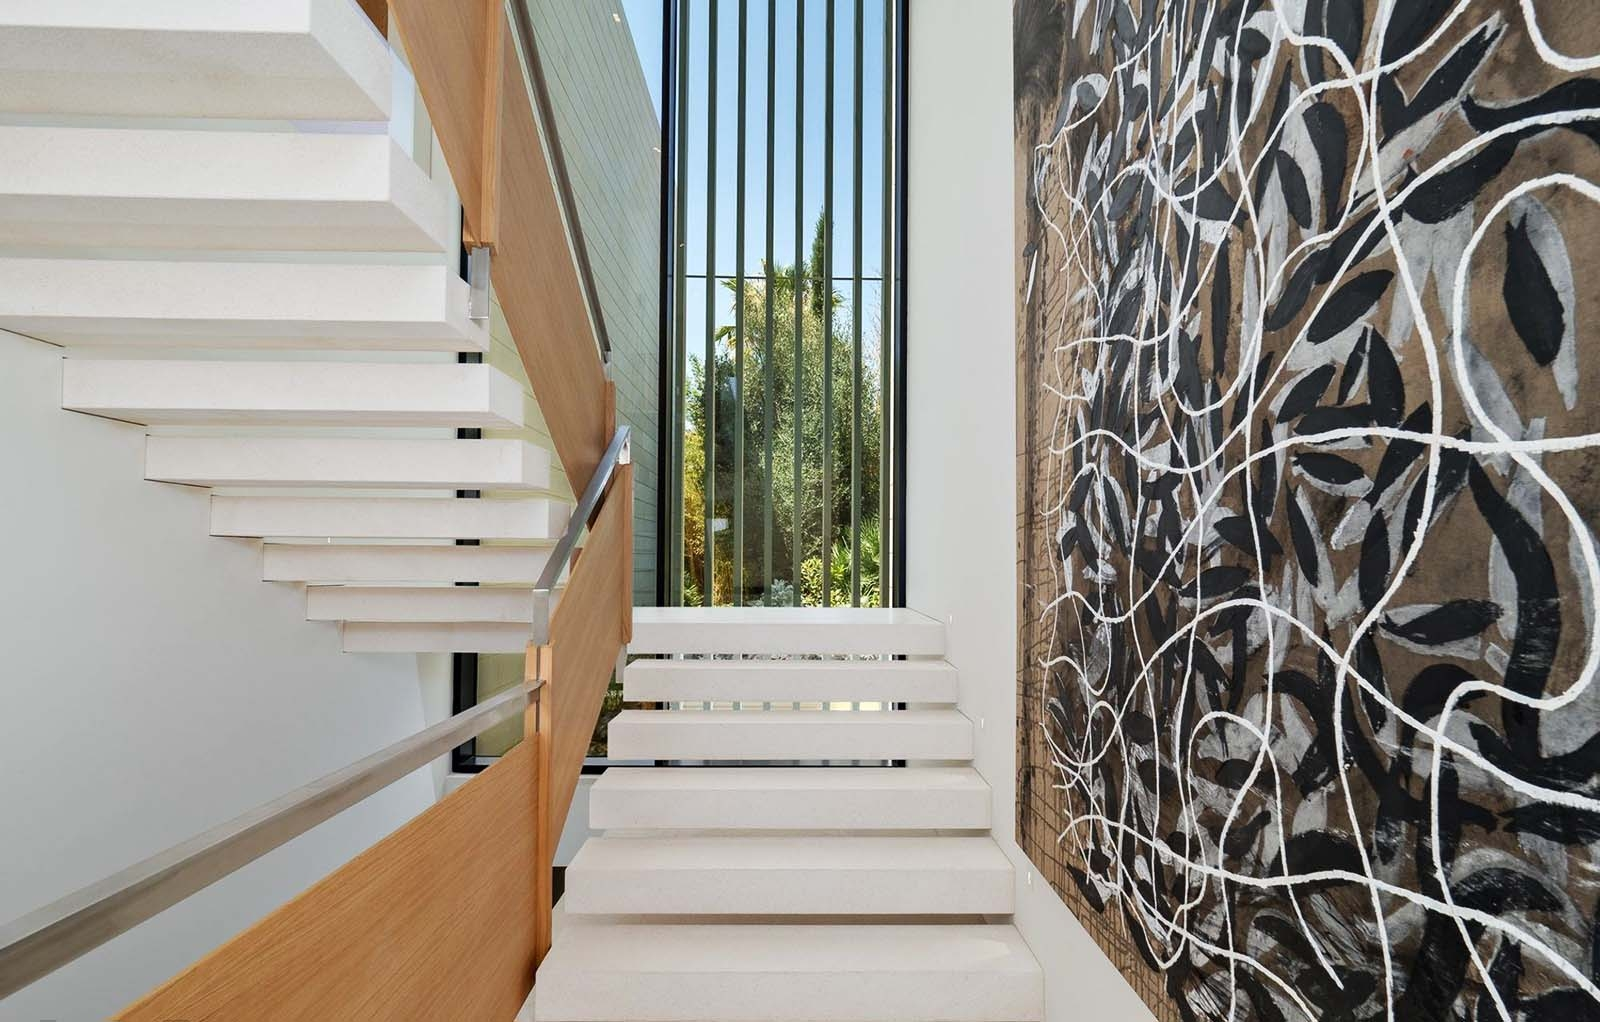 Modern Staircase Design Contemporary Stair Design Ideas | Modern Stair Hand Railing | Creative Outdoor Stair | Wooden Stair | Decorative | Curved Metal | Diy Modern